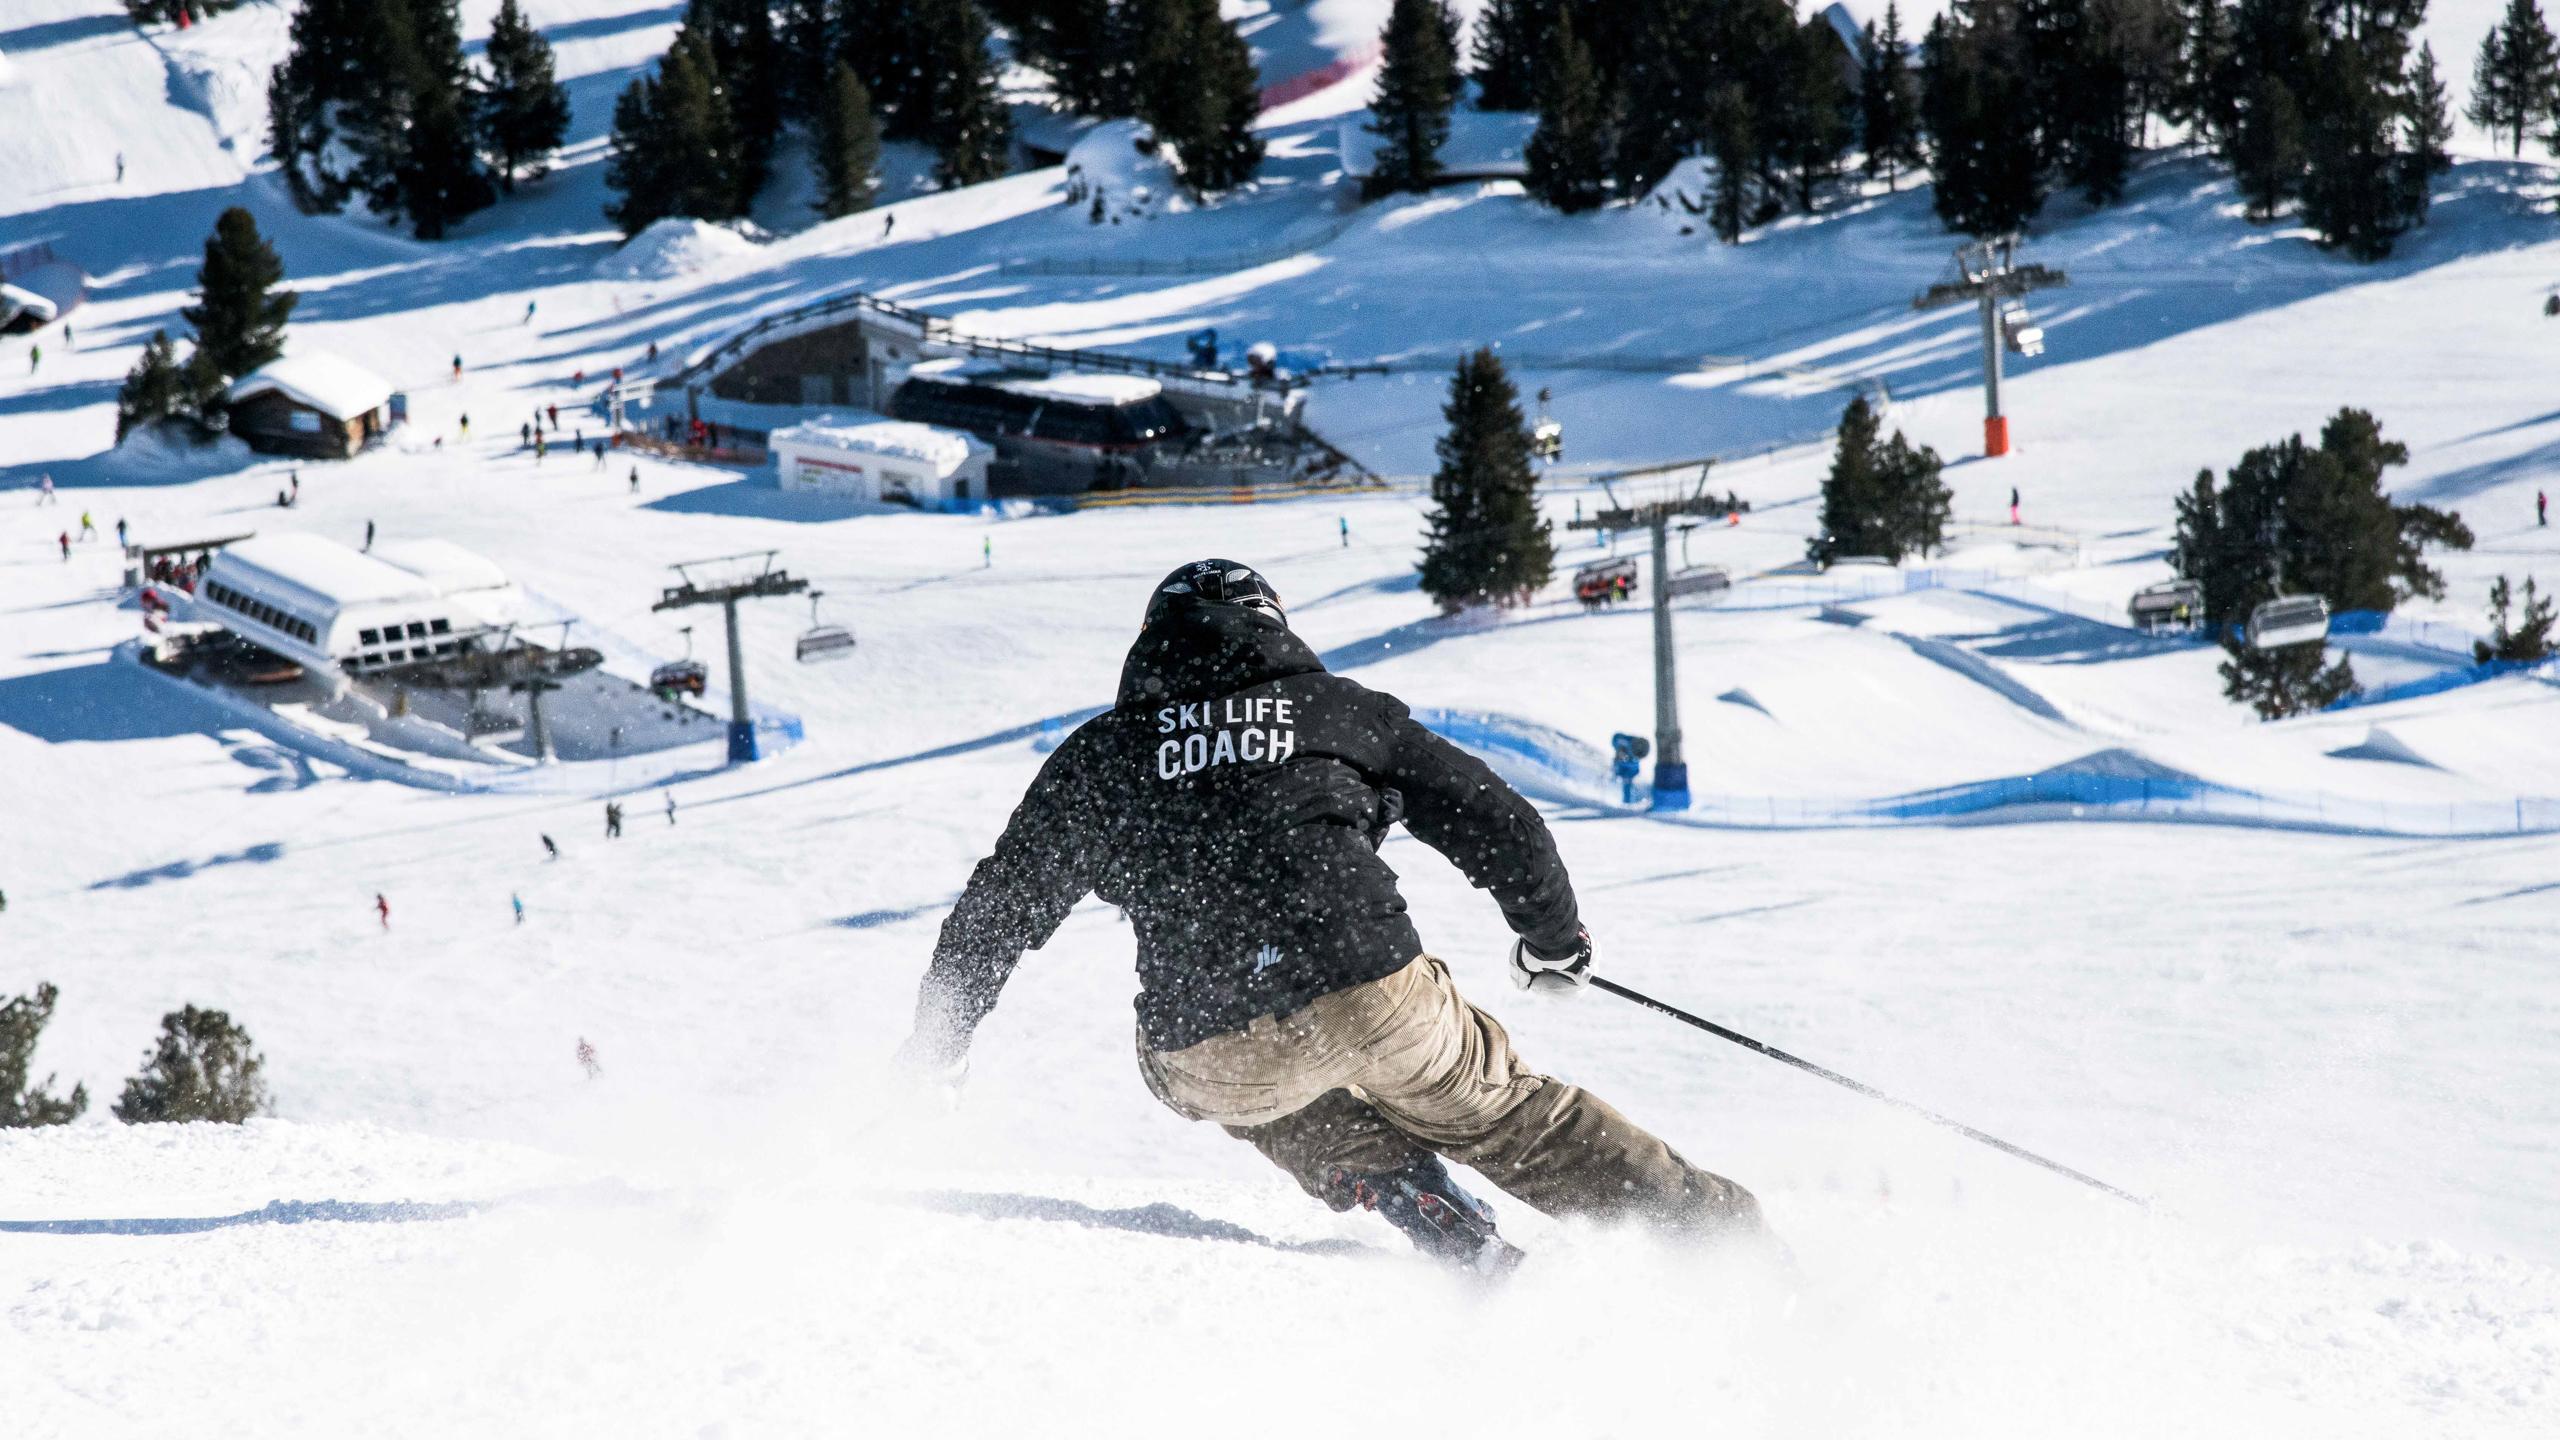 Early morning skiing